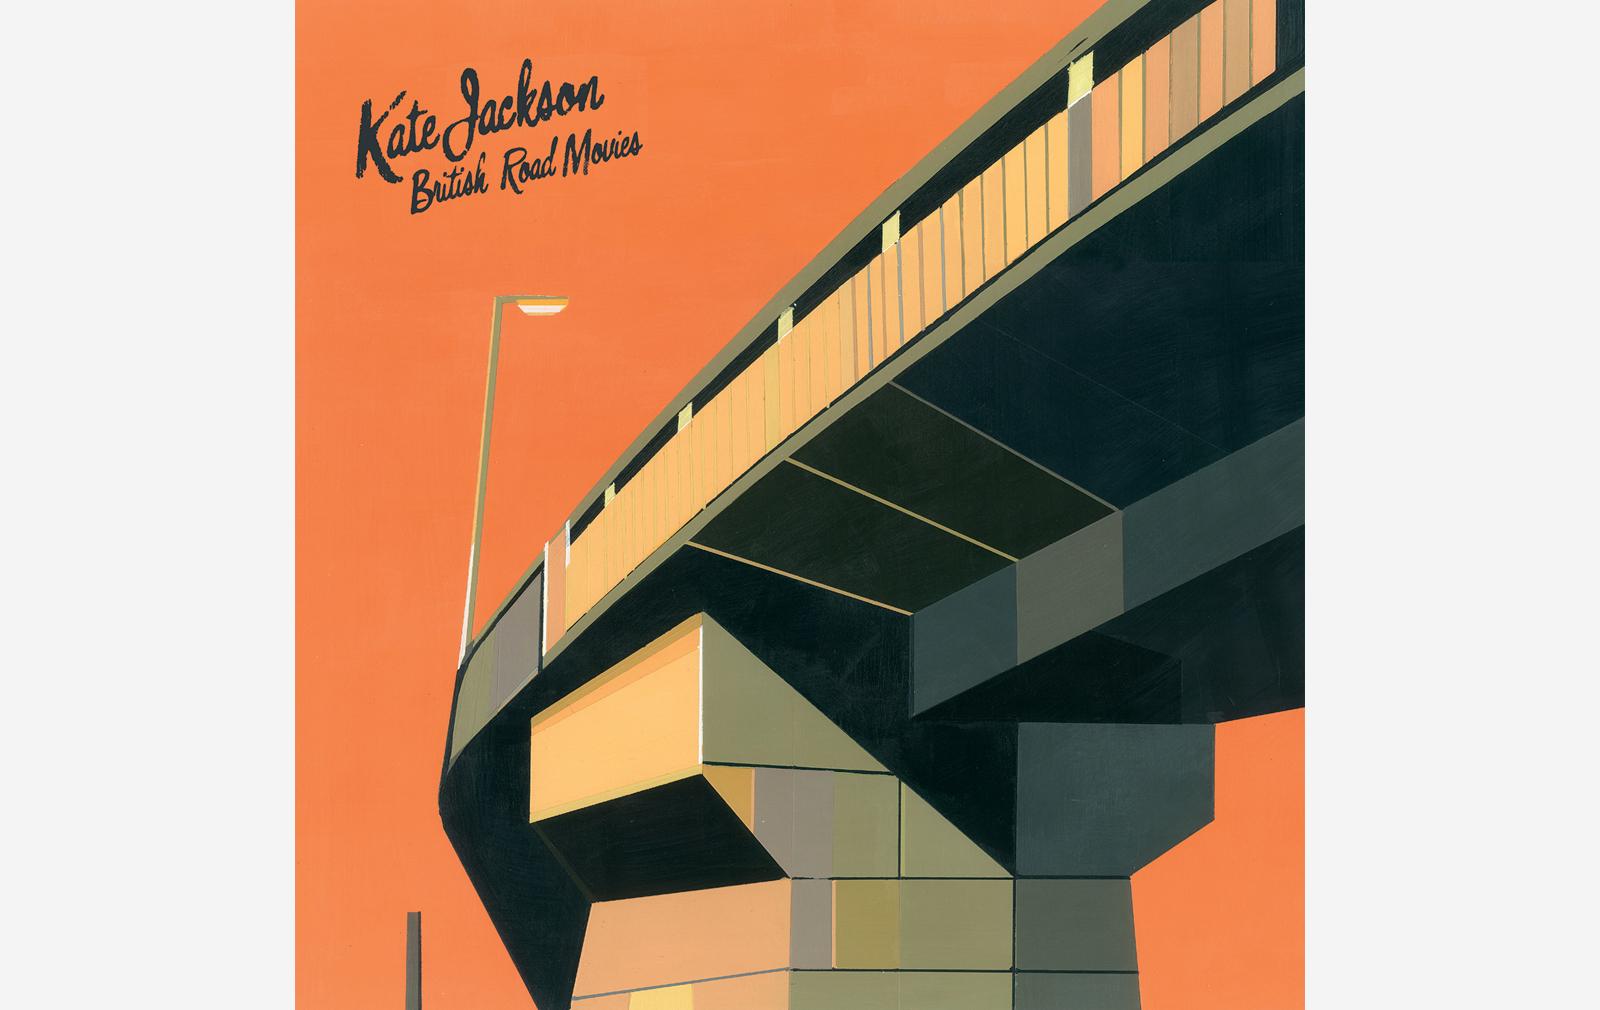 British Road Movies artwork by Kate Jackson